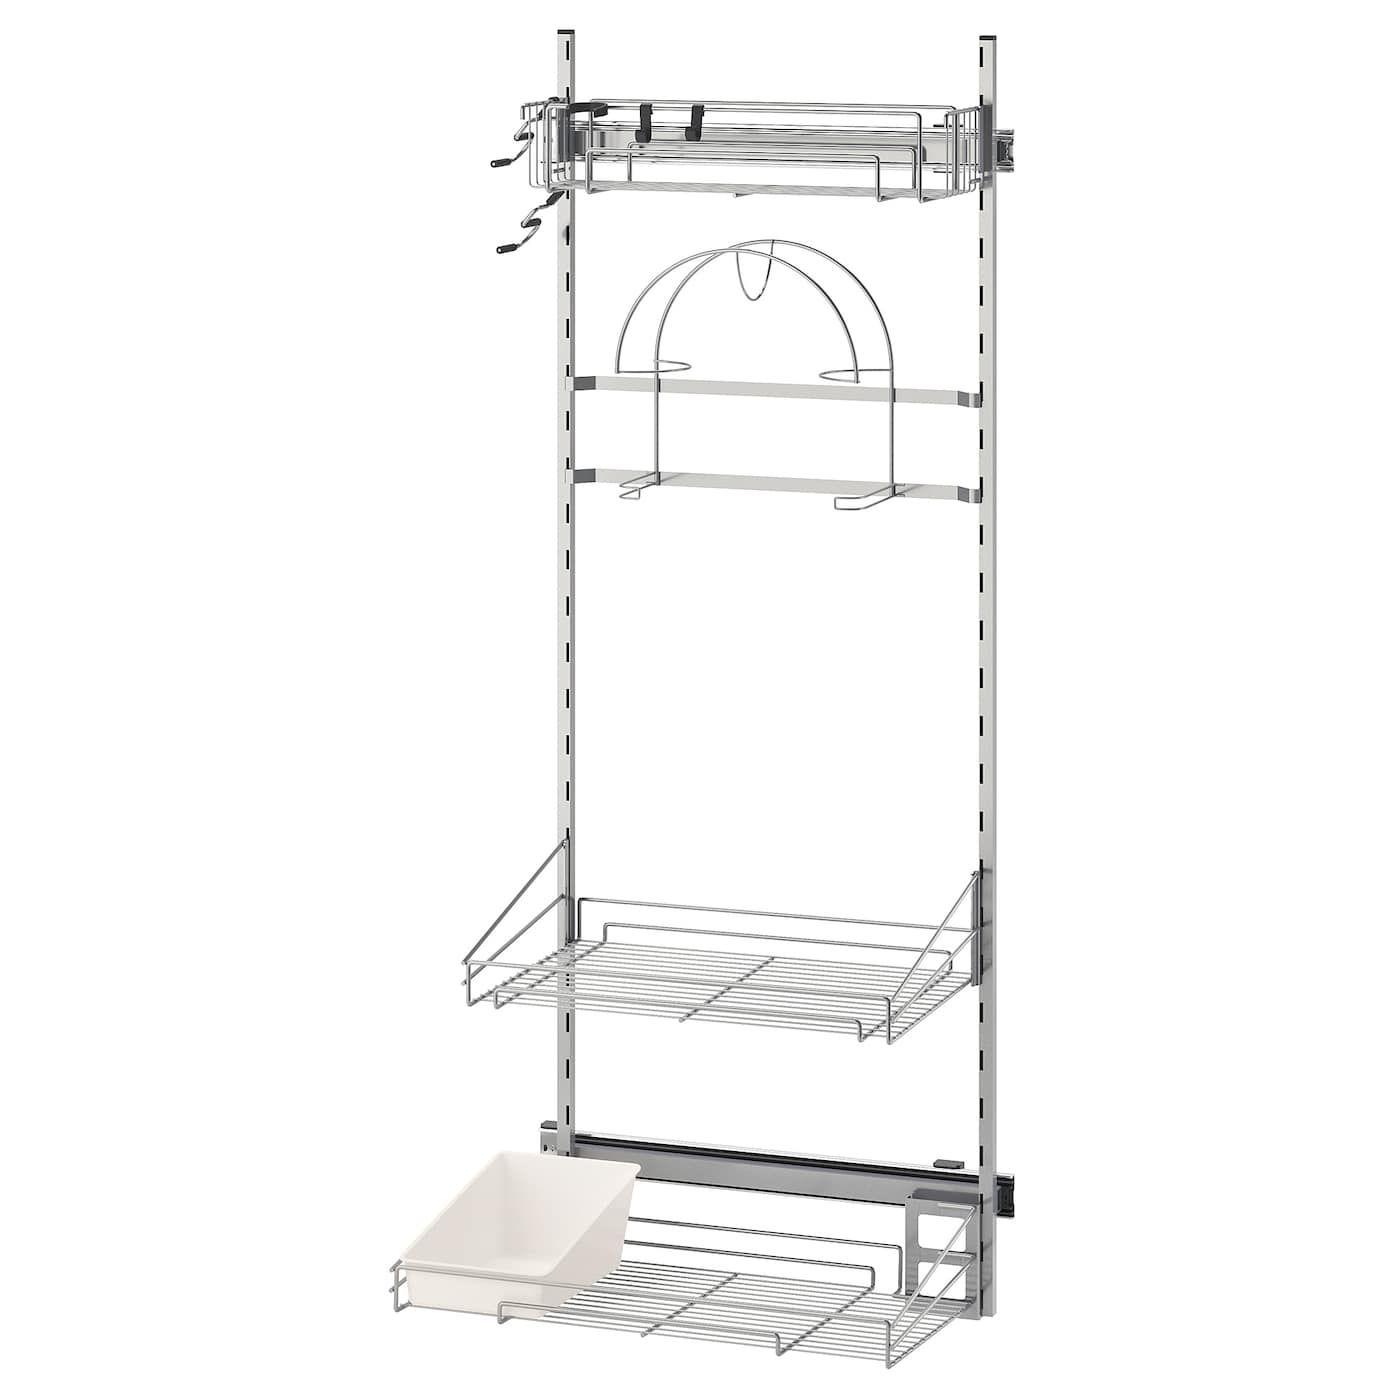 Utrusta Putzschrankeinrichtung Ikea Putzschrank Kuchenstauraum